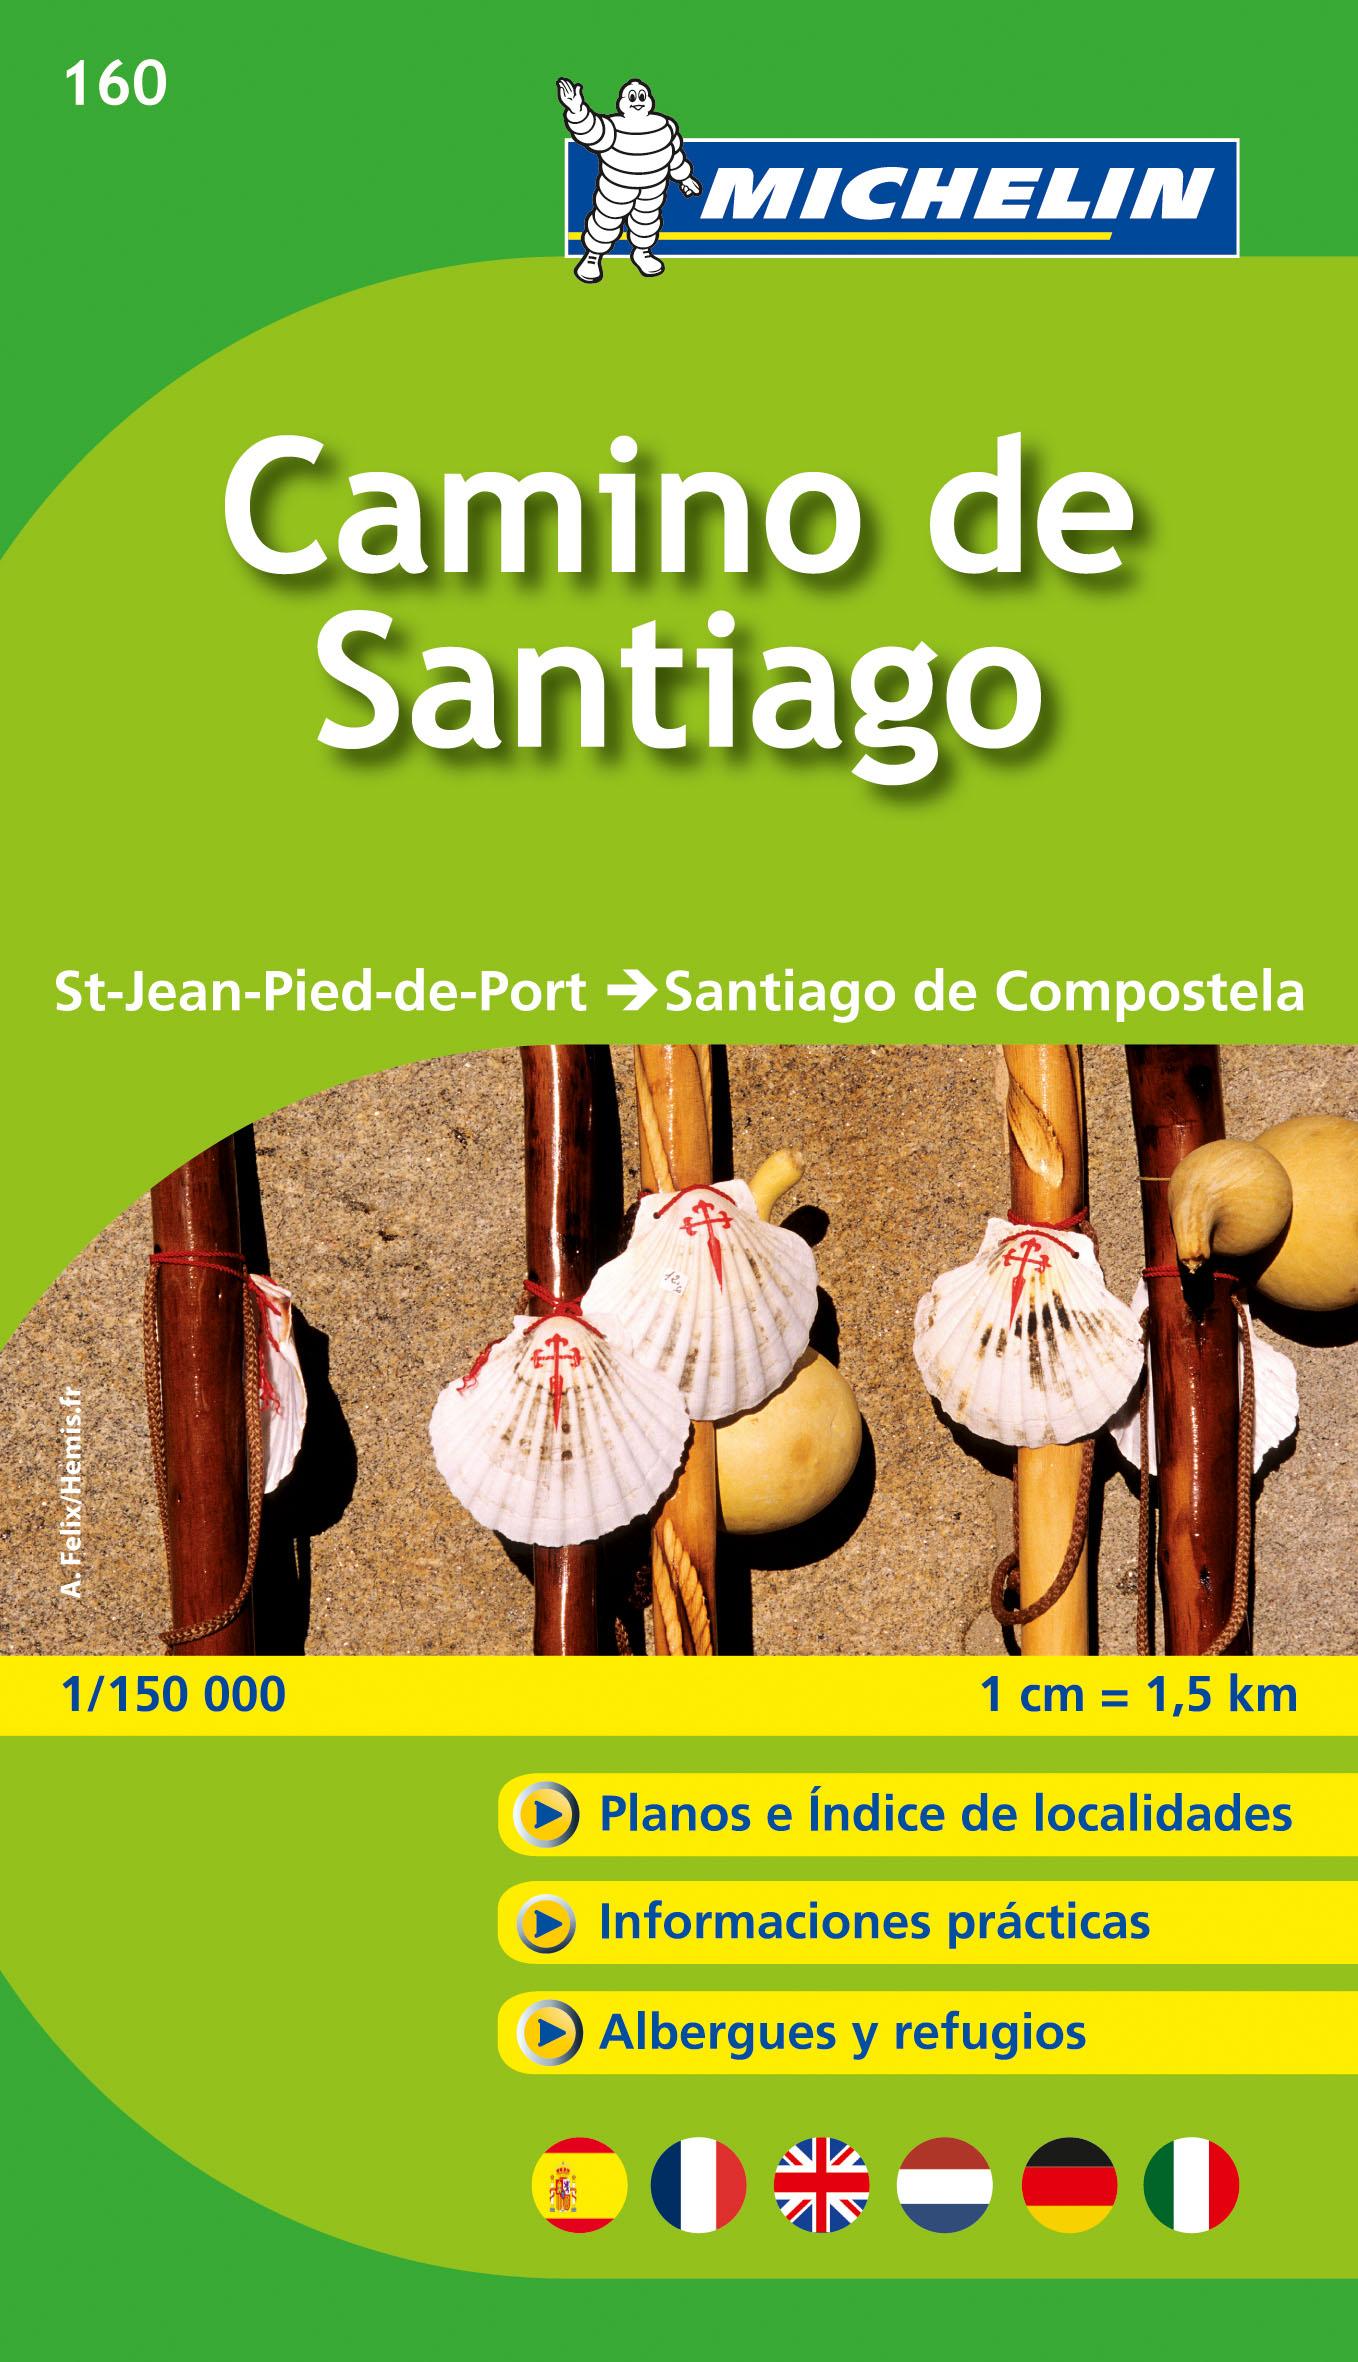 Wandelgids - Pelgrimsroute (kaart) 160 Camino de Santiago | Michelin